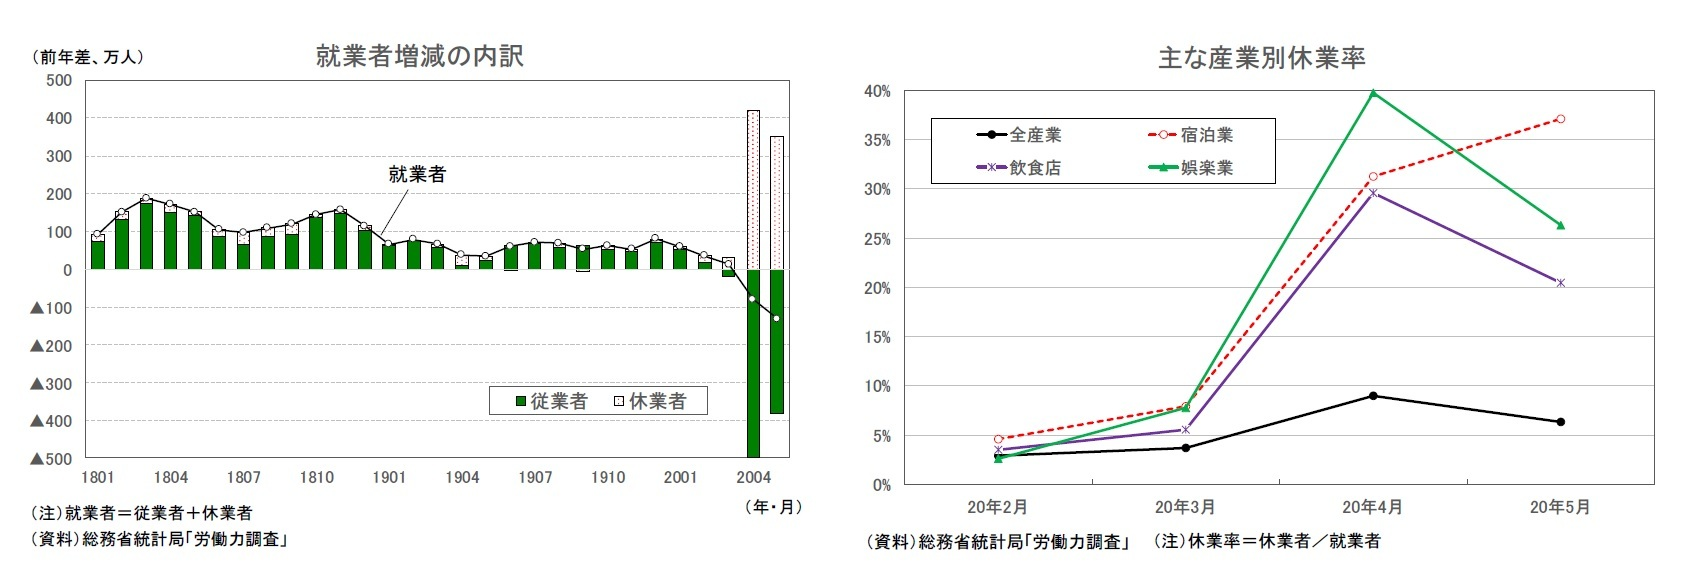 就業者増減の内訳/主な産業別休業率